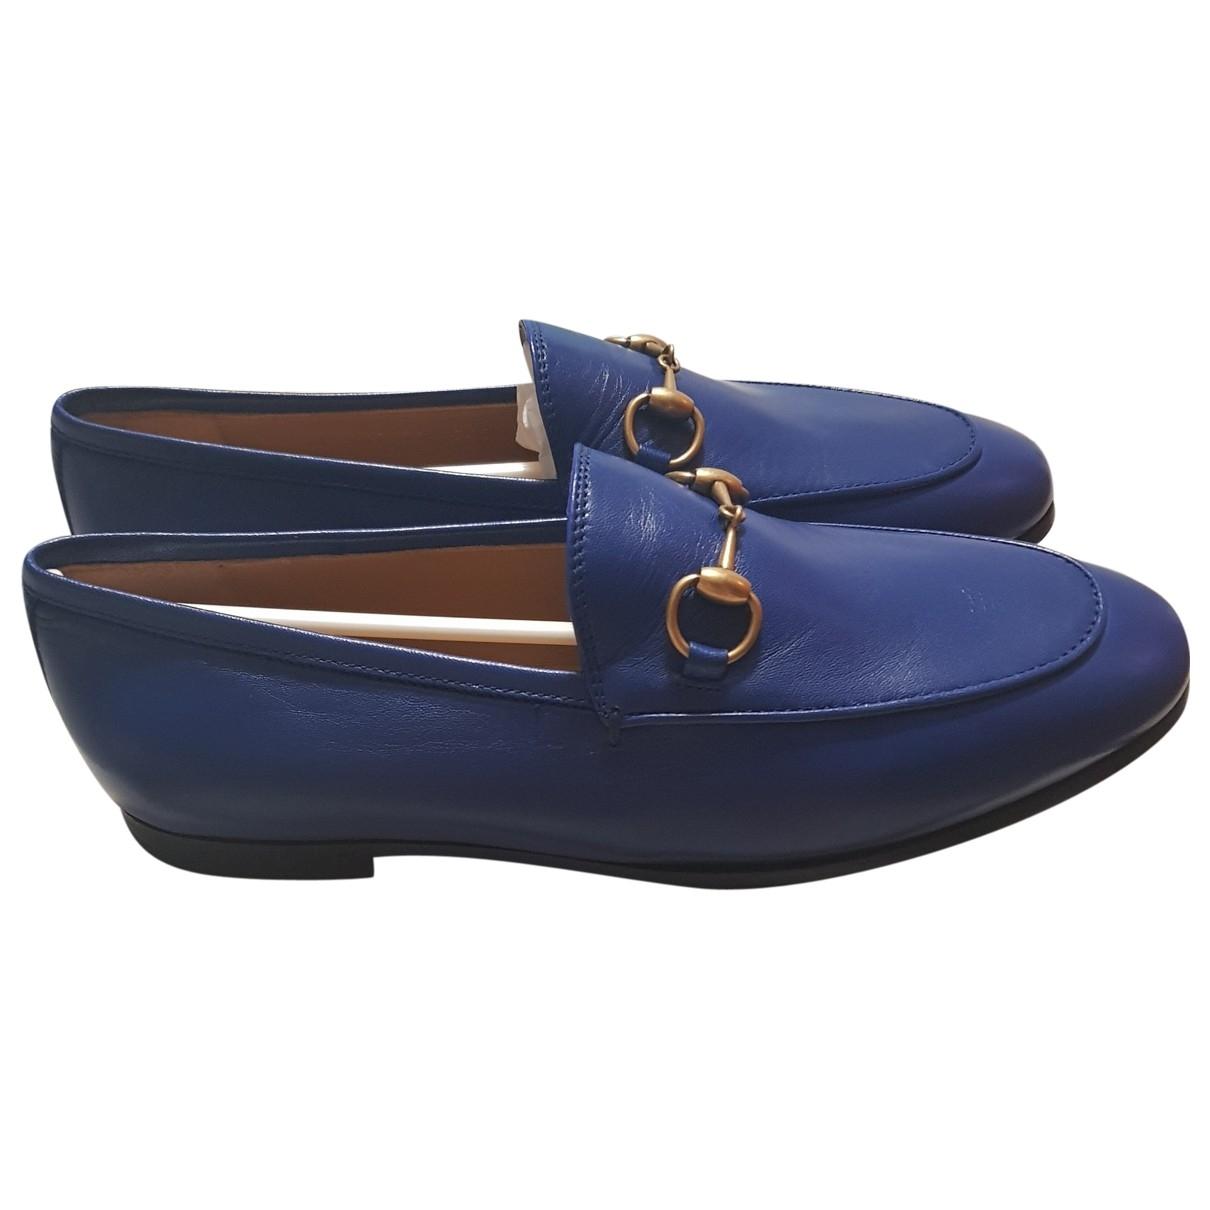 Gucci Jordaan Blue Leather Flats for Women 36 EU